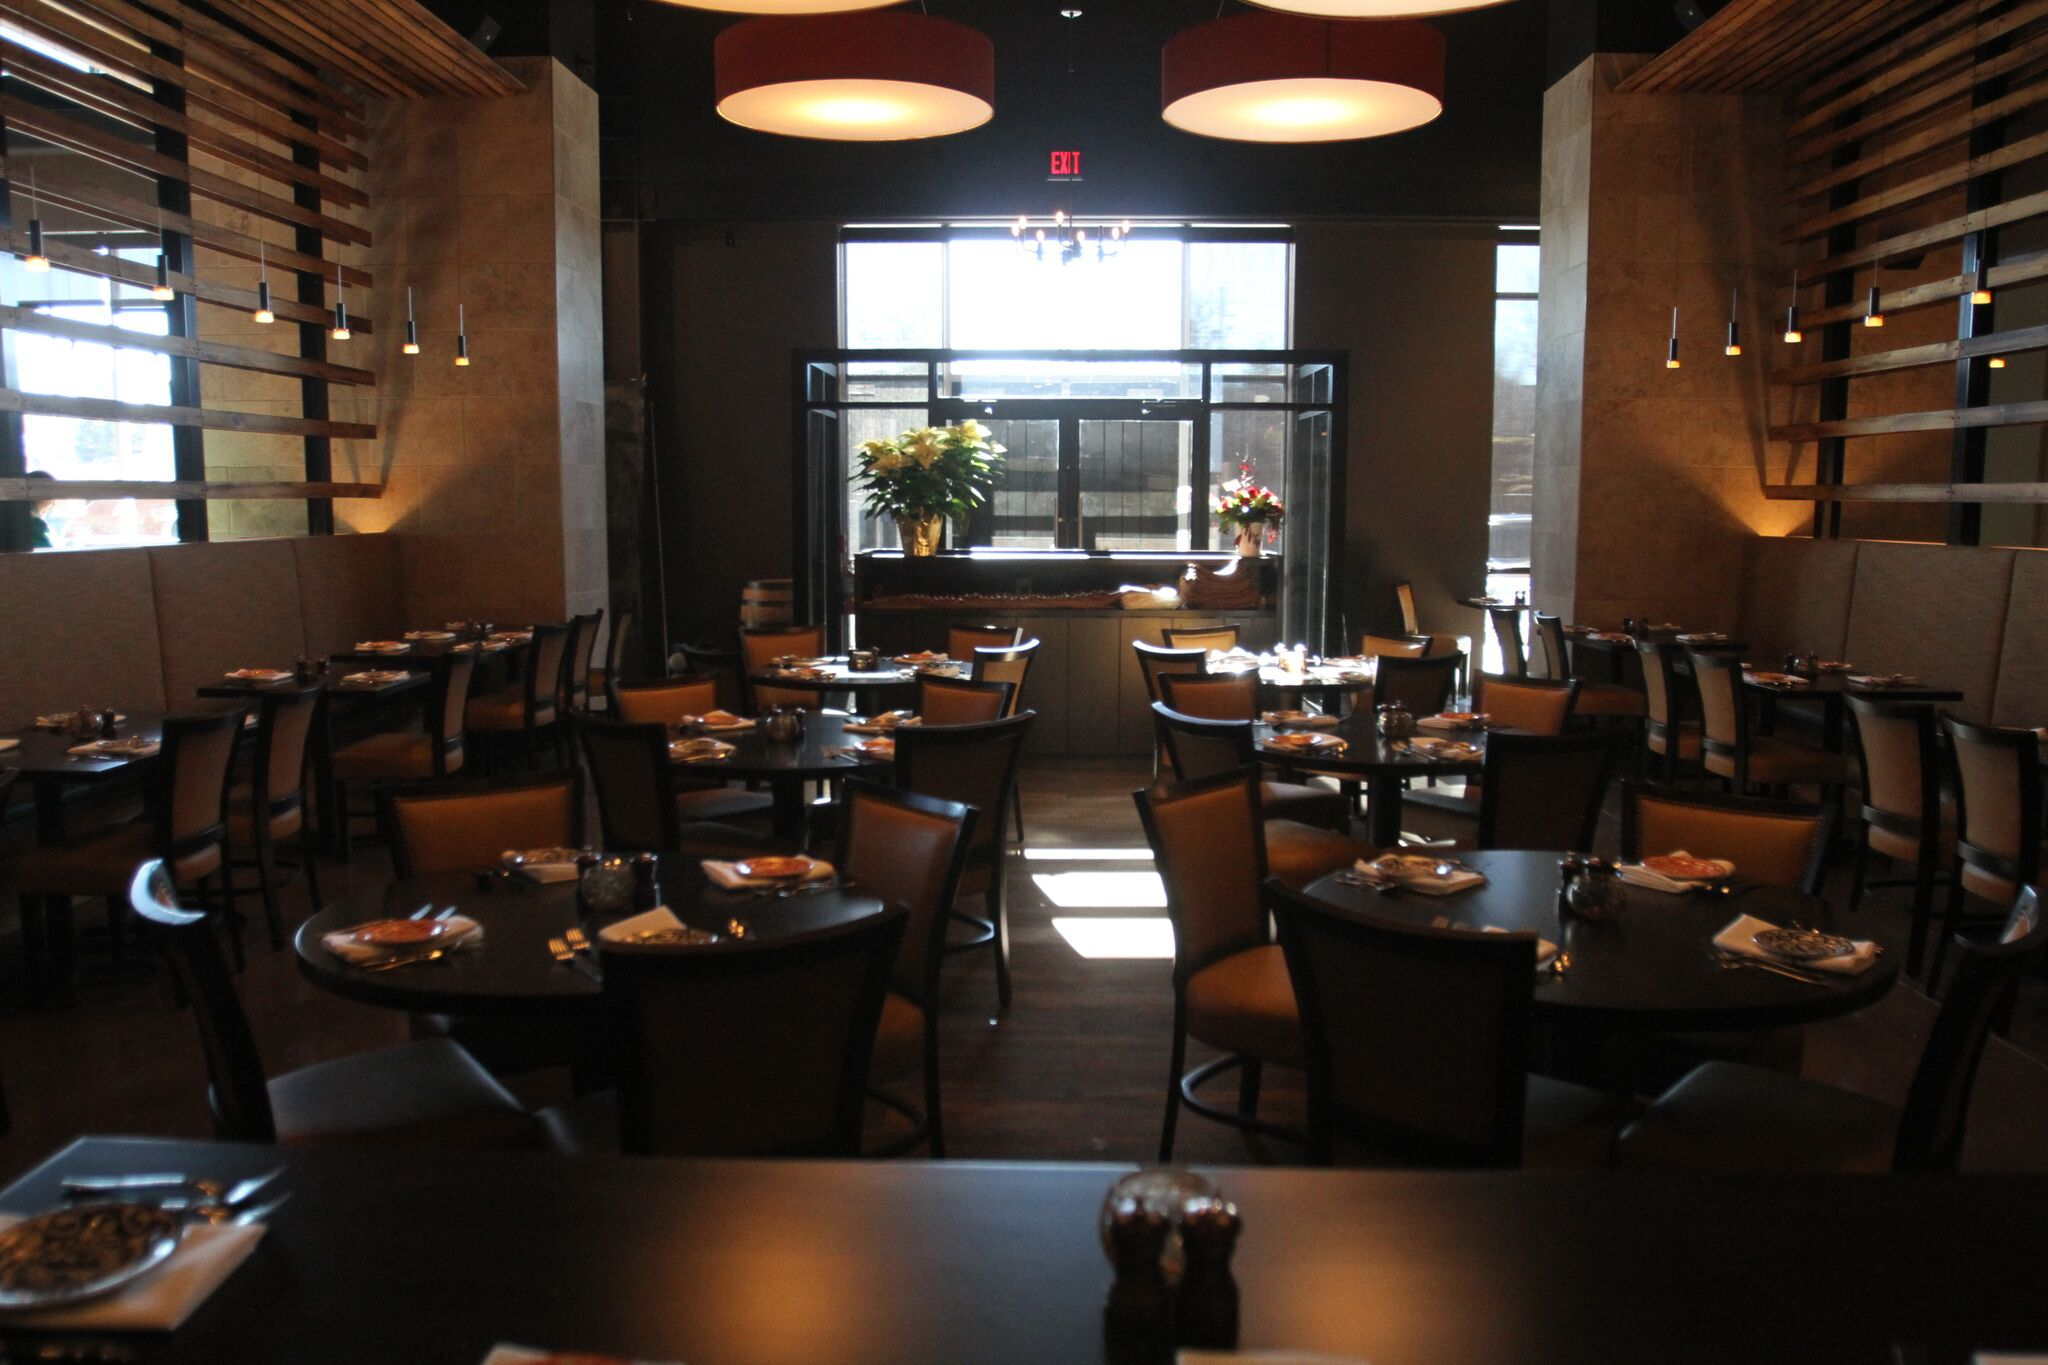 BRUNCH MENU for West Des Moines Restaurant Blu Toro Cantina + Grill Menu Restaurant interior